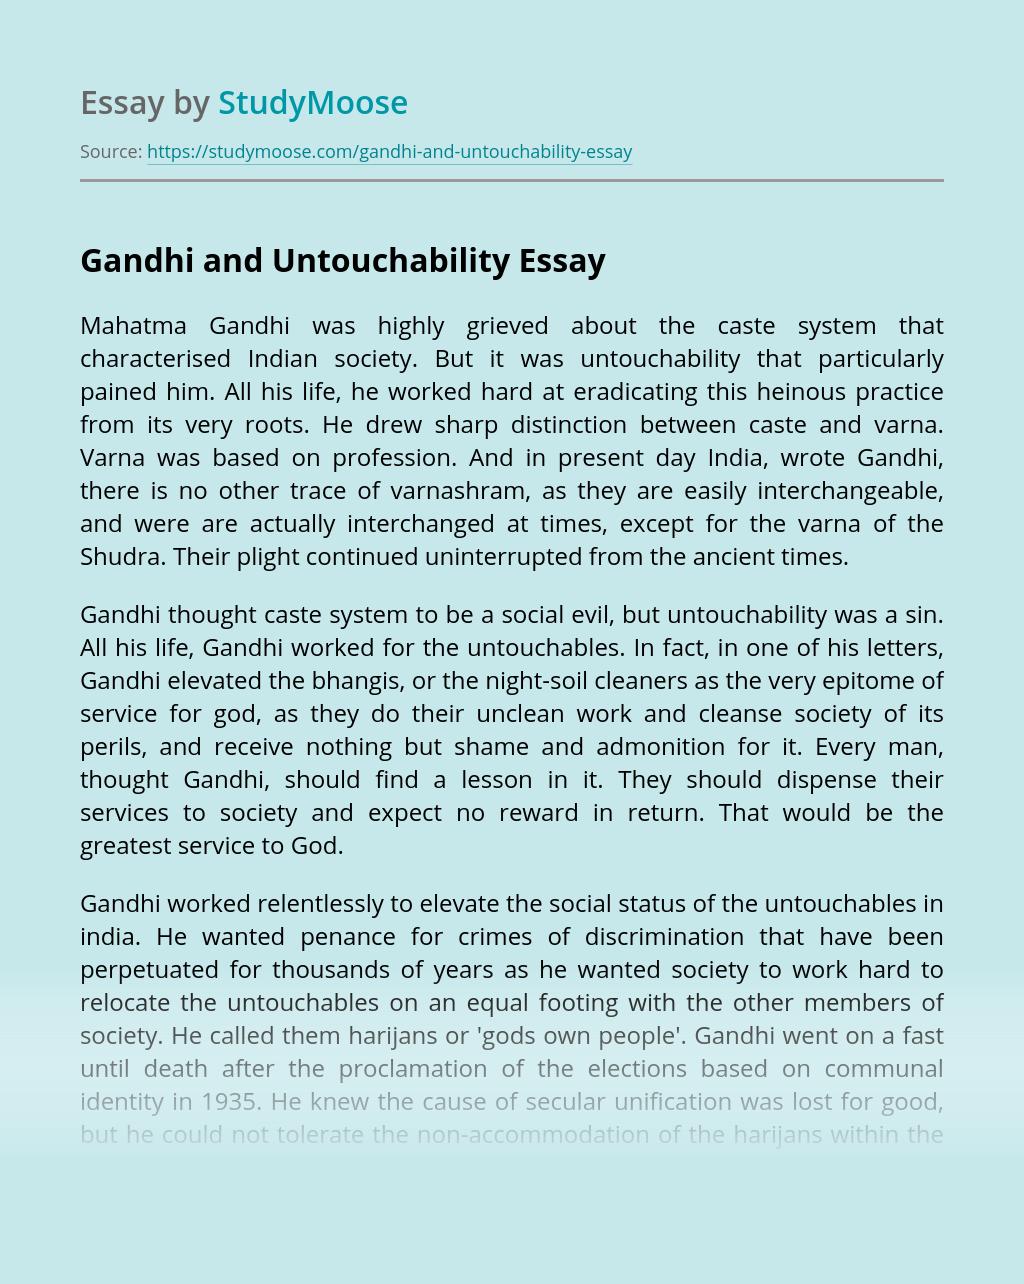 Gandhi and Untouchability